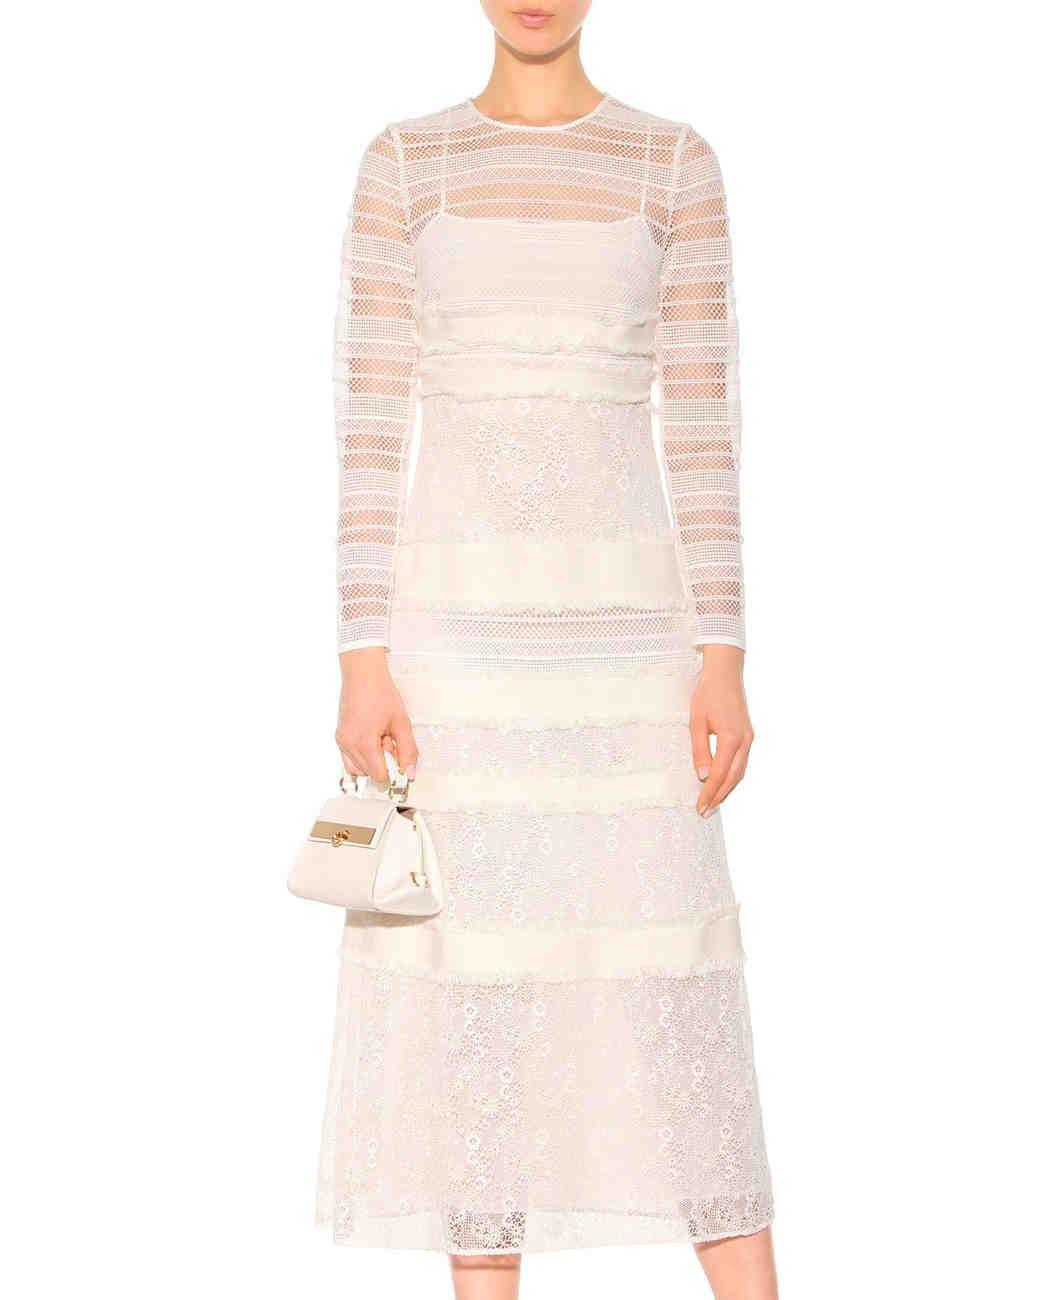 engagement-party-dresses-burberry--mytheresa-1215.jpg